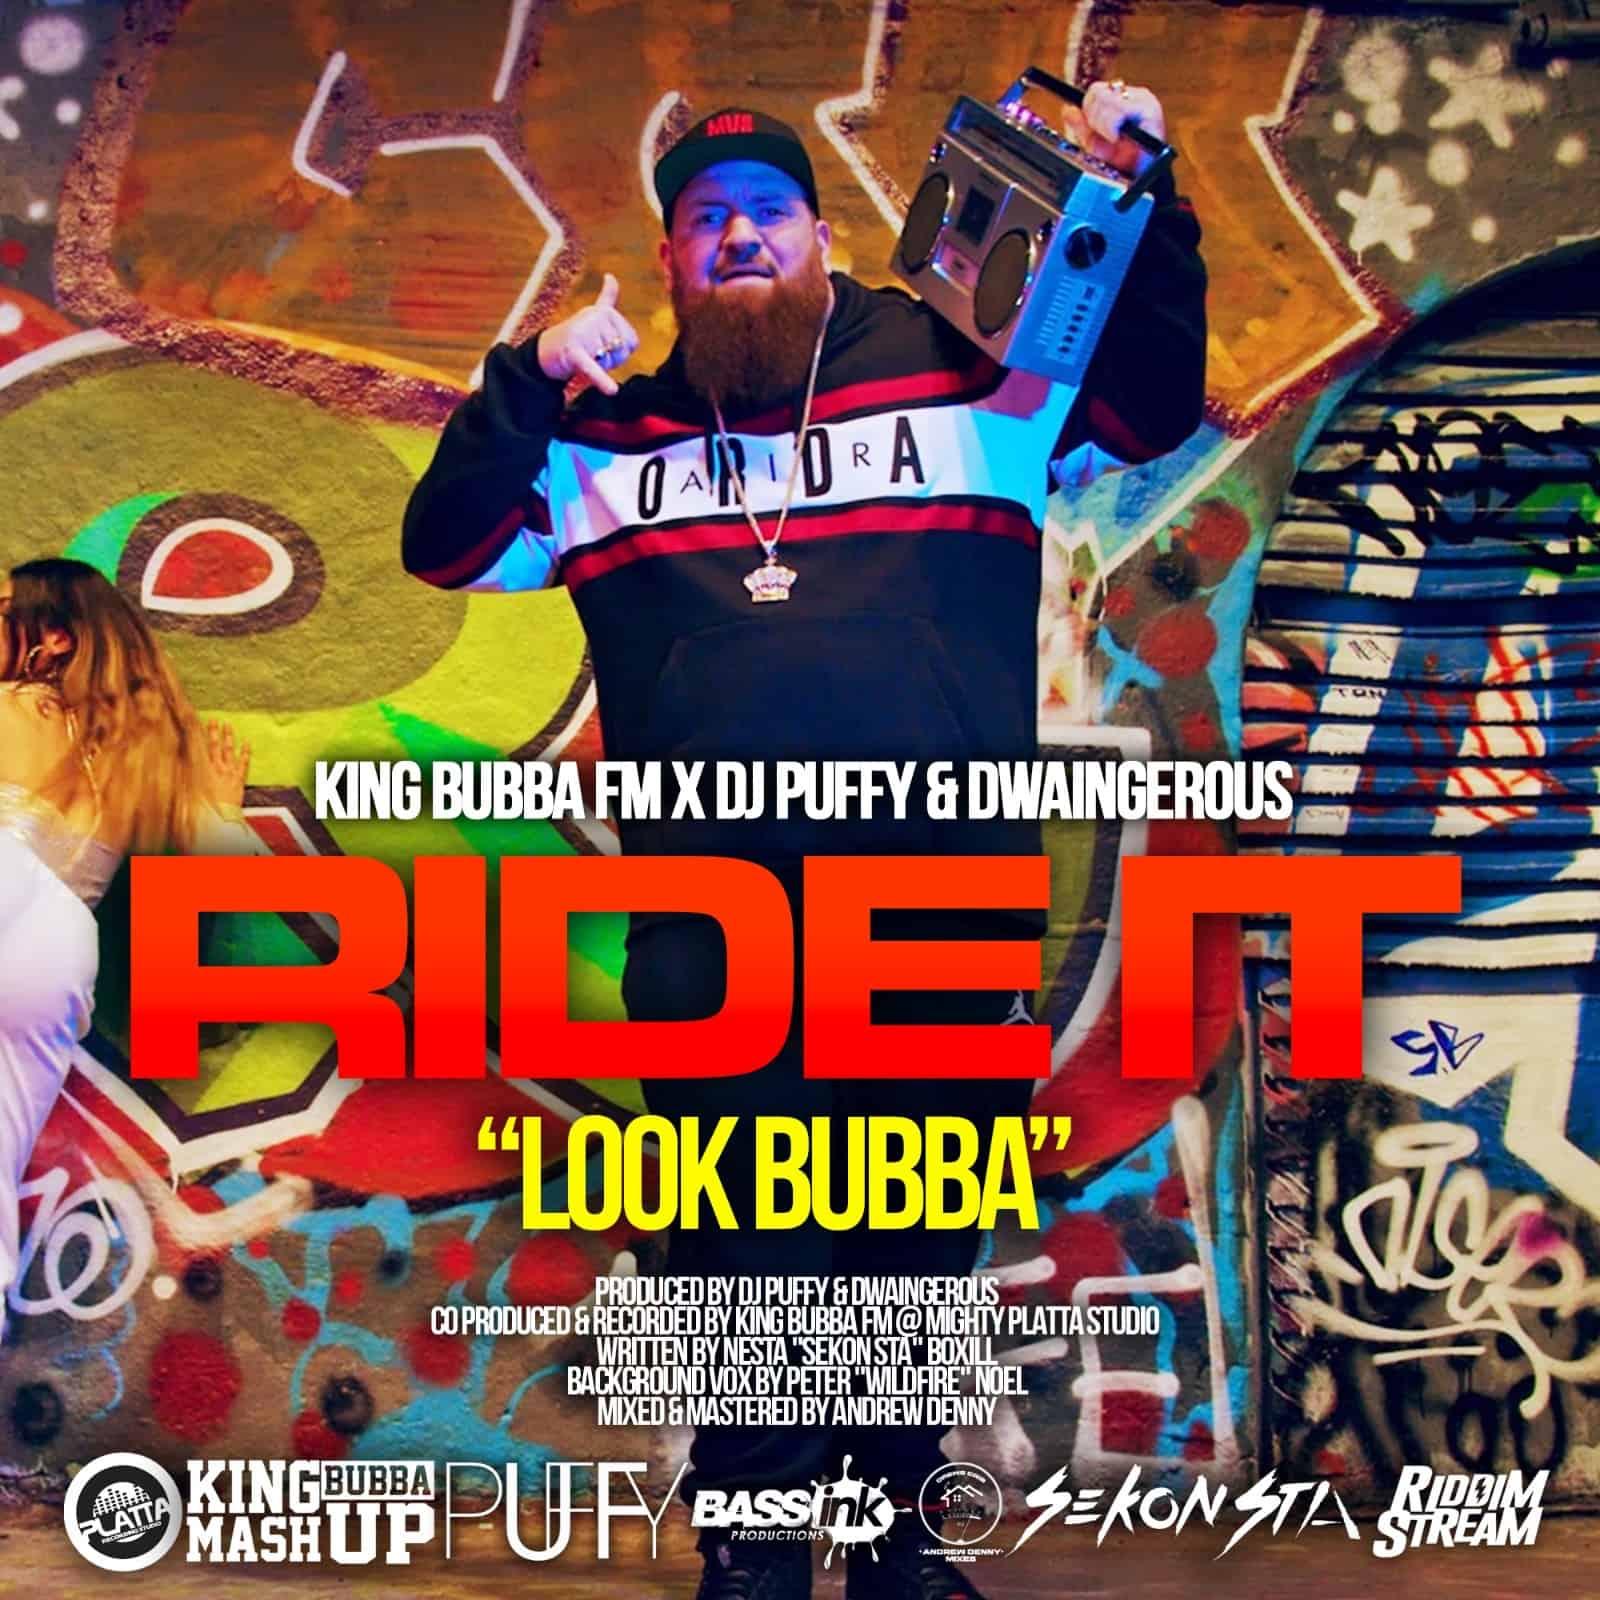 KING BUBBA FM, Dj Puffy & Dwaingerous - Ride It (Look Bubba!)